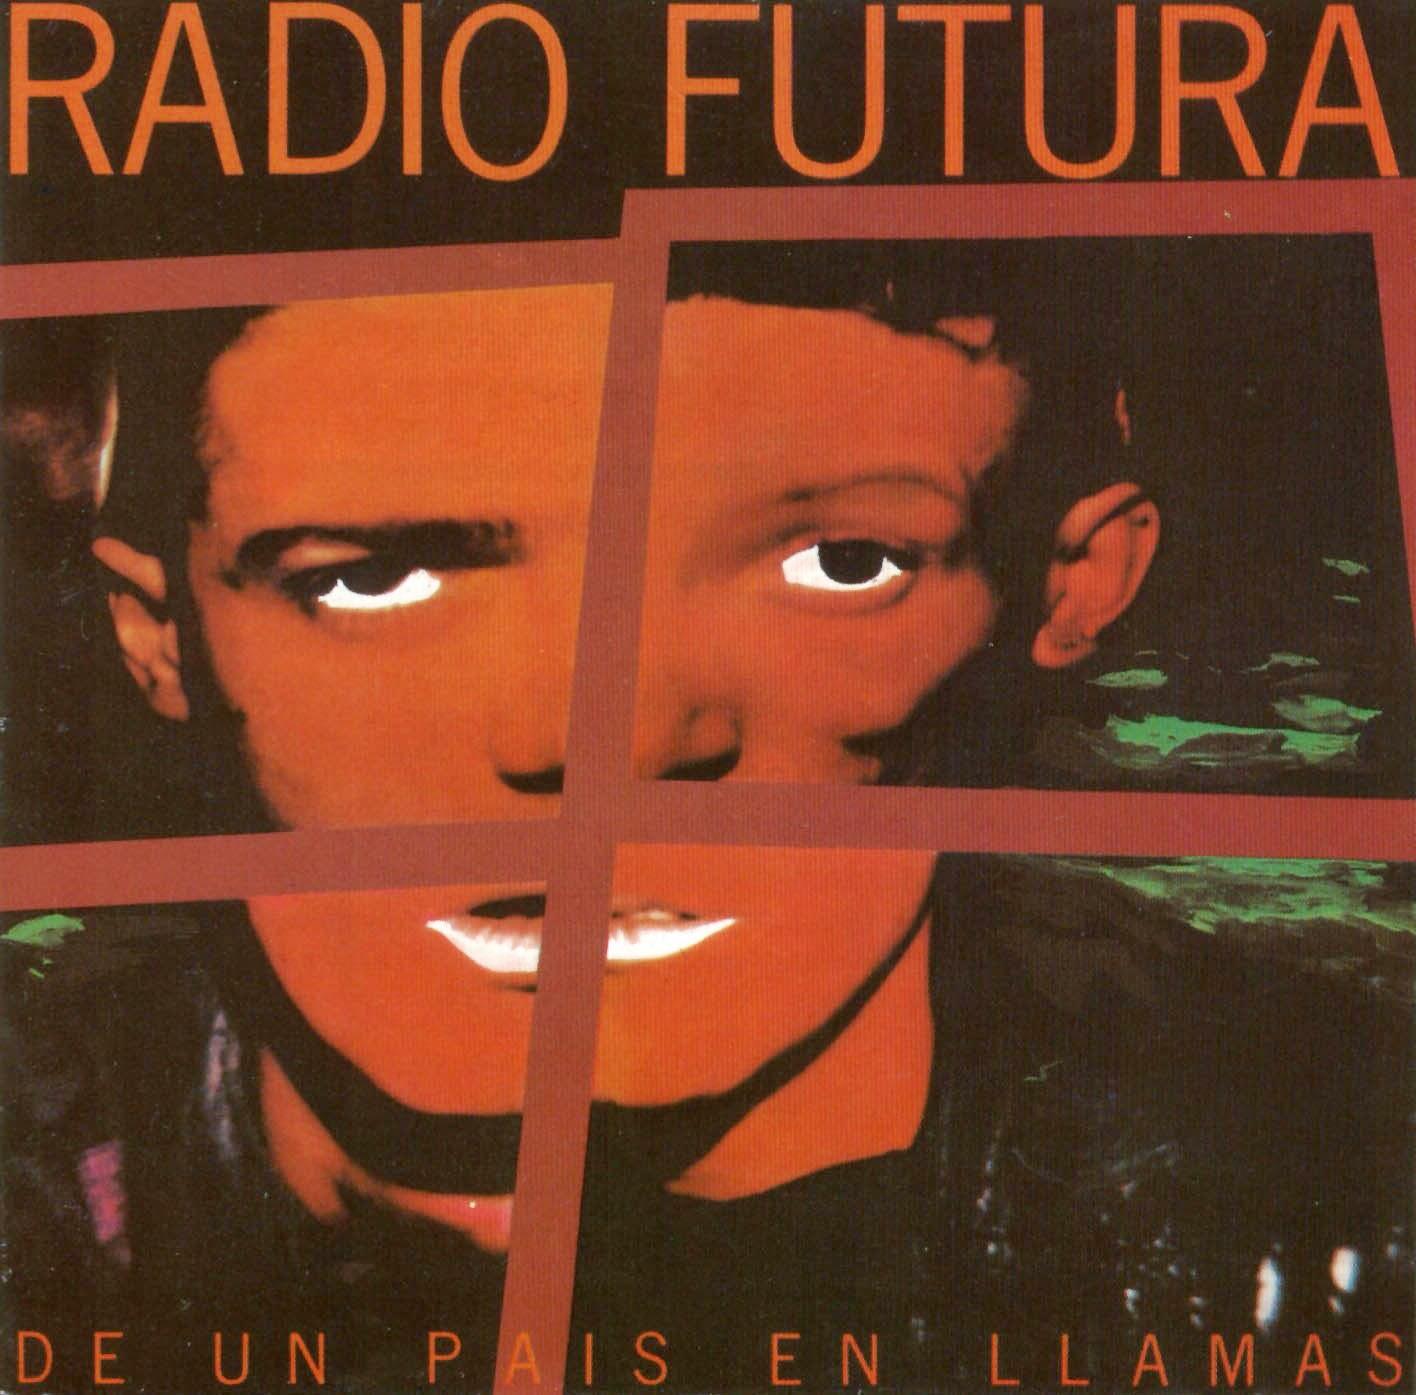 Radio_Futura-De_Un_Pais_En_Llamas-Frontal